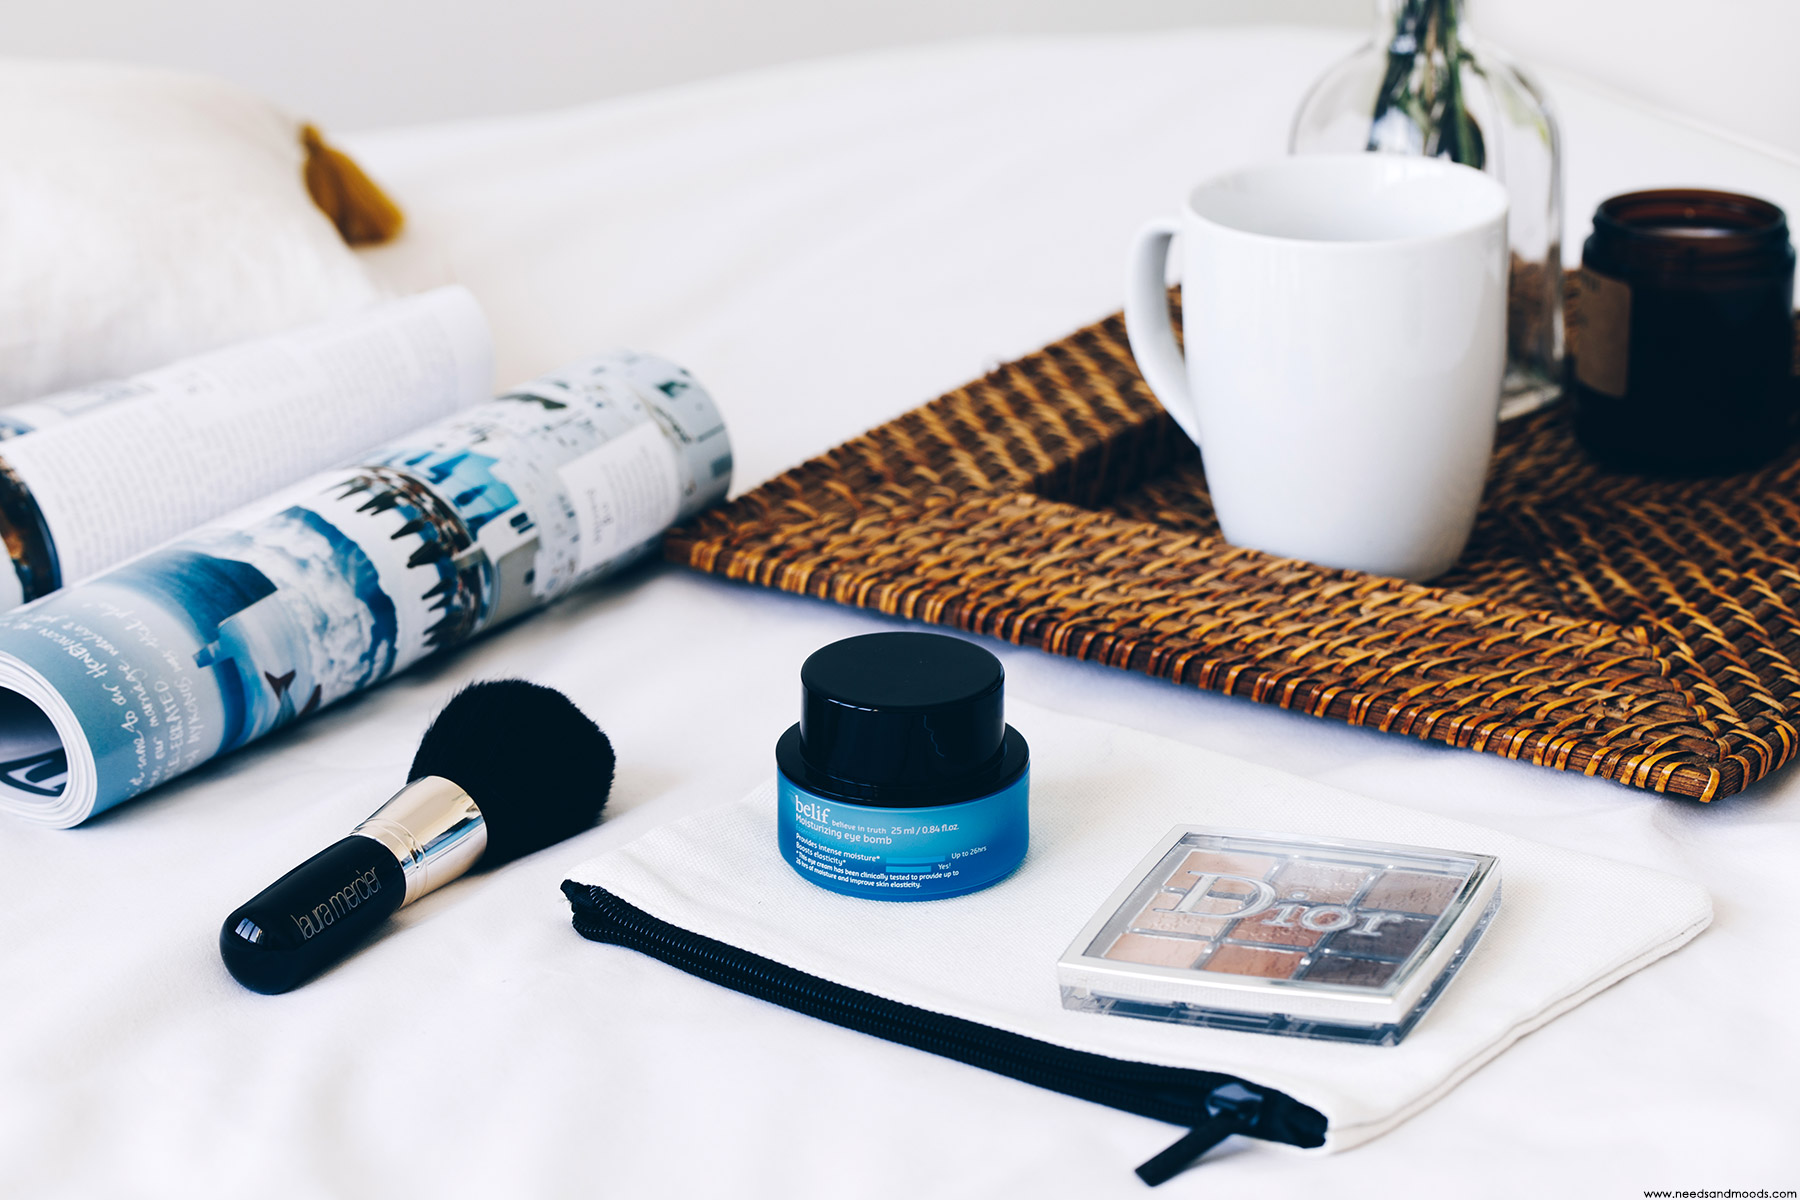 moisturizing eye bomb belif avis